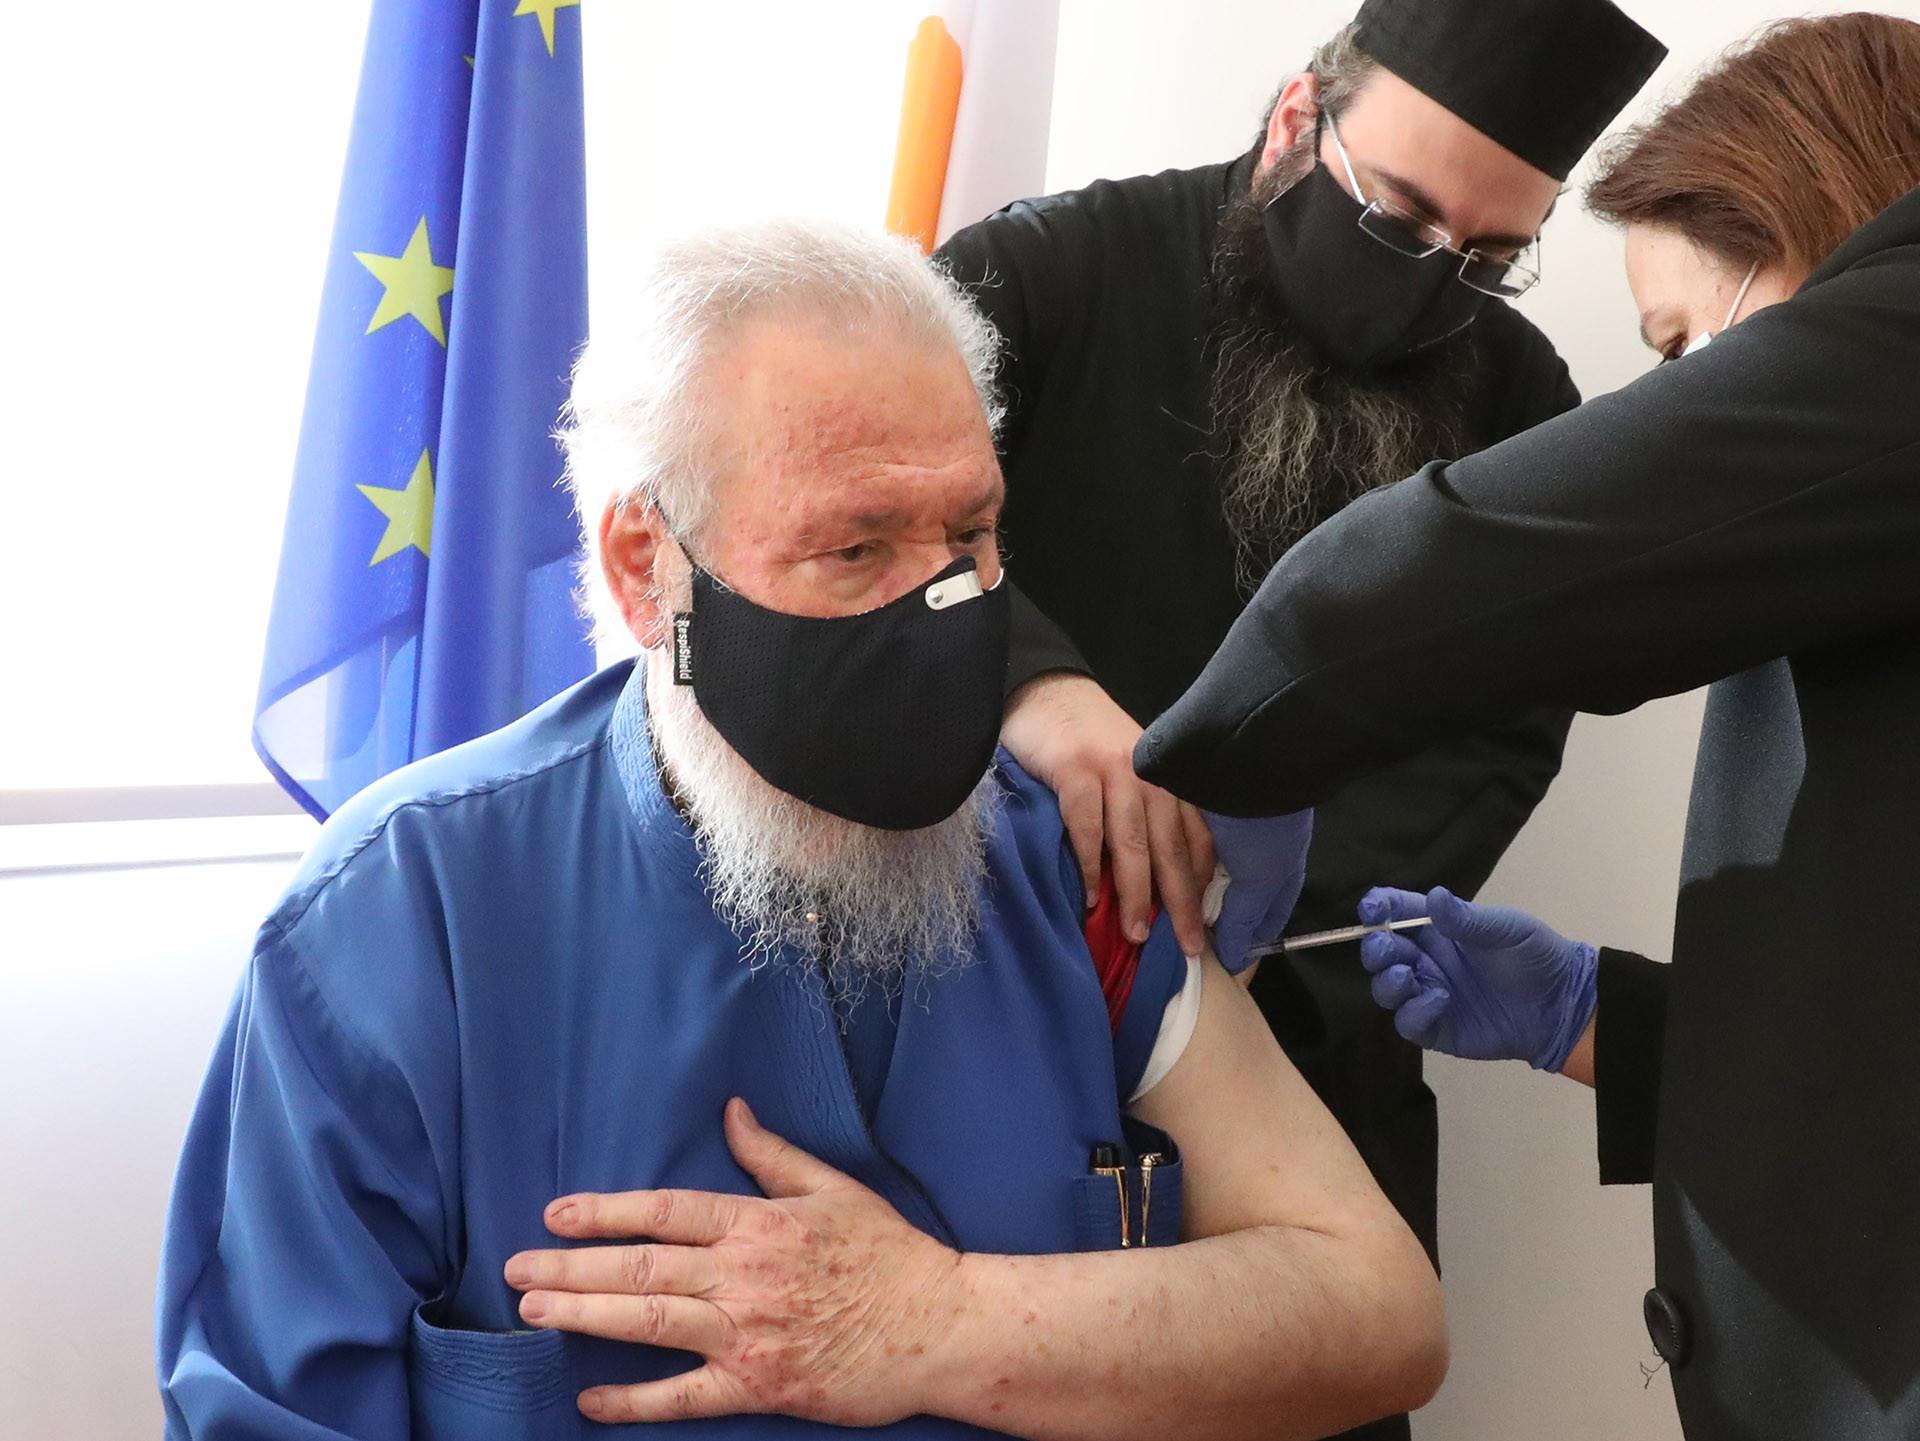 COVID19: Τέσσερις θάνατοι και 907 περιπτώσεις υποδηλώνουν νέο κλείδωμα στην Κύπρο